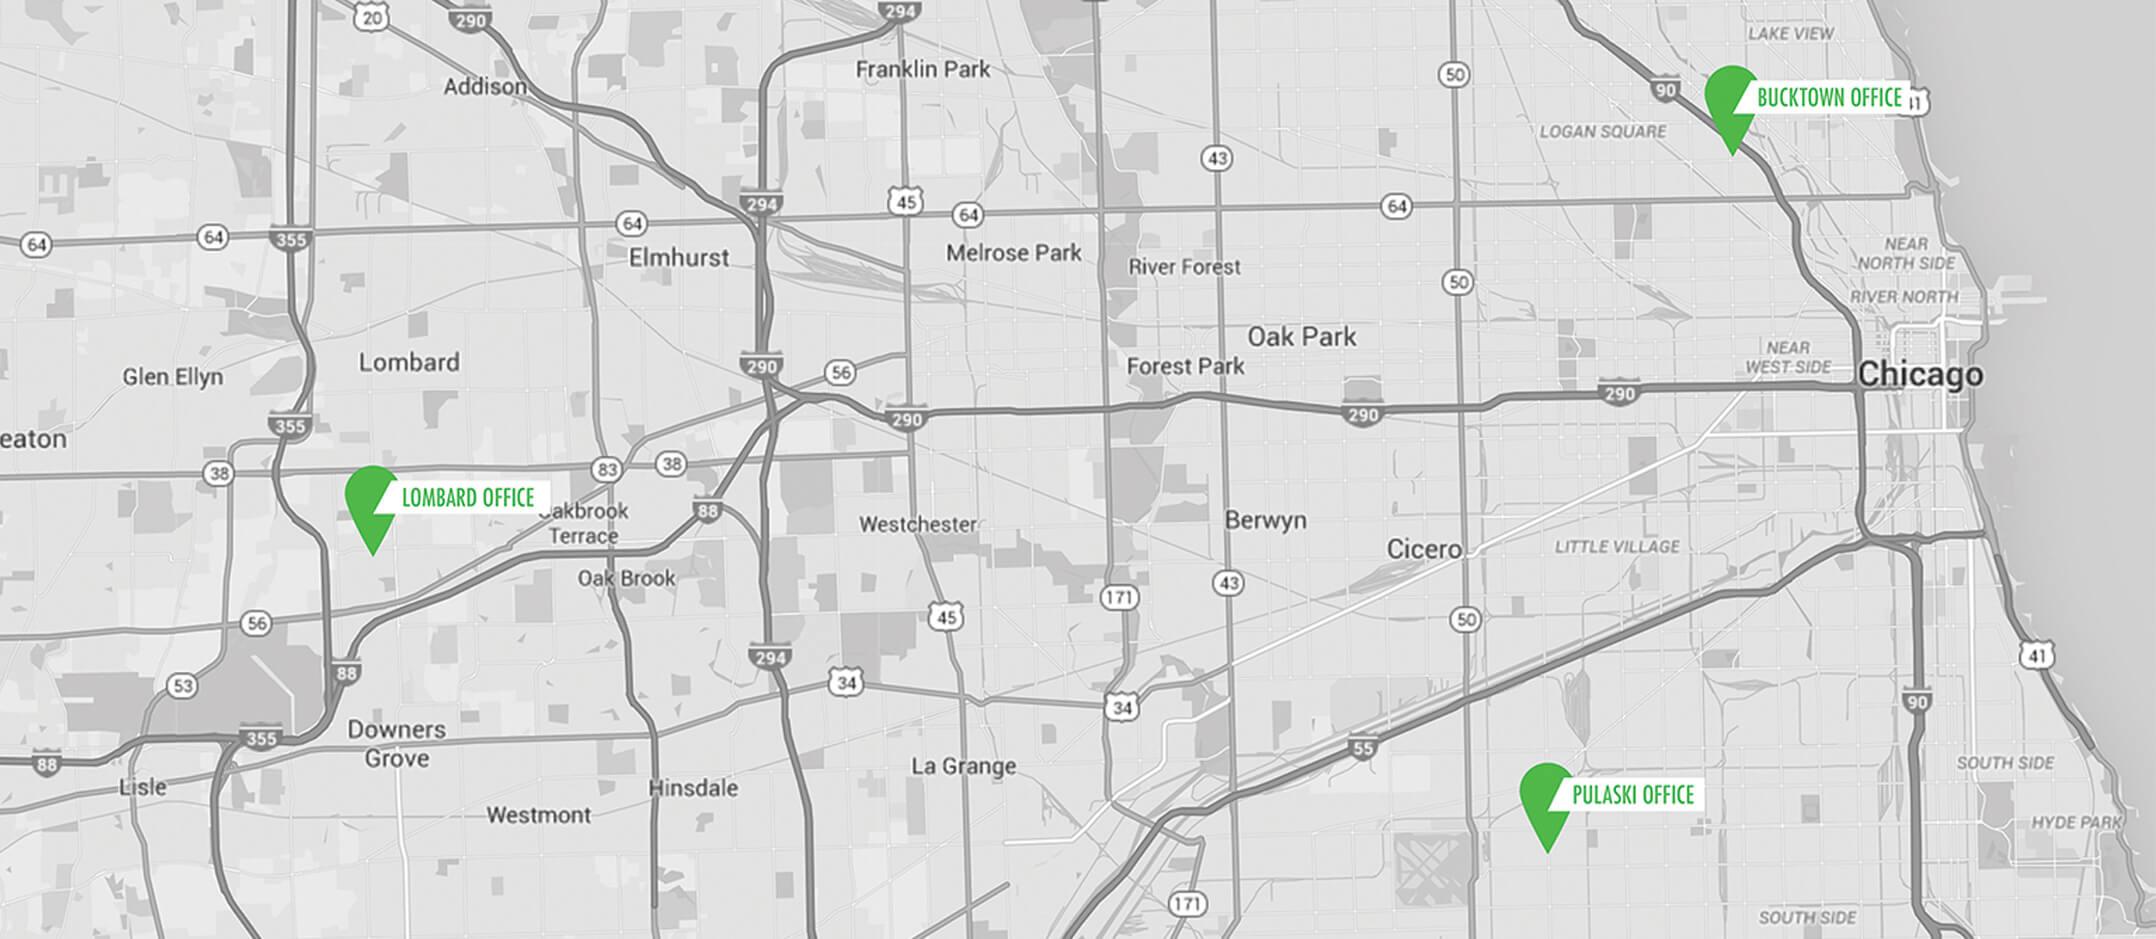 neighborhood loans map and locations